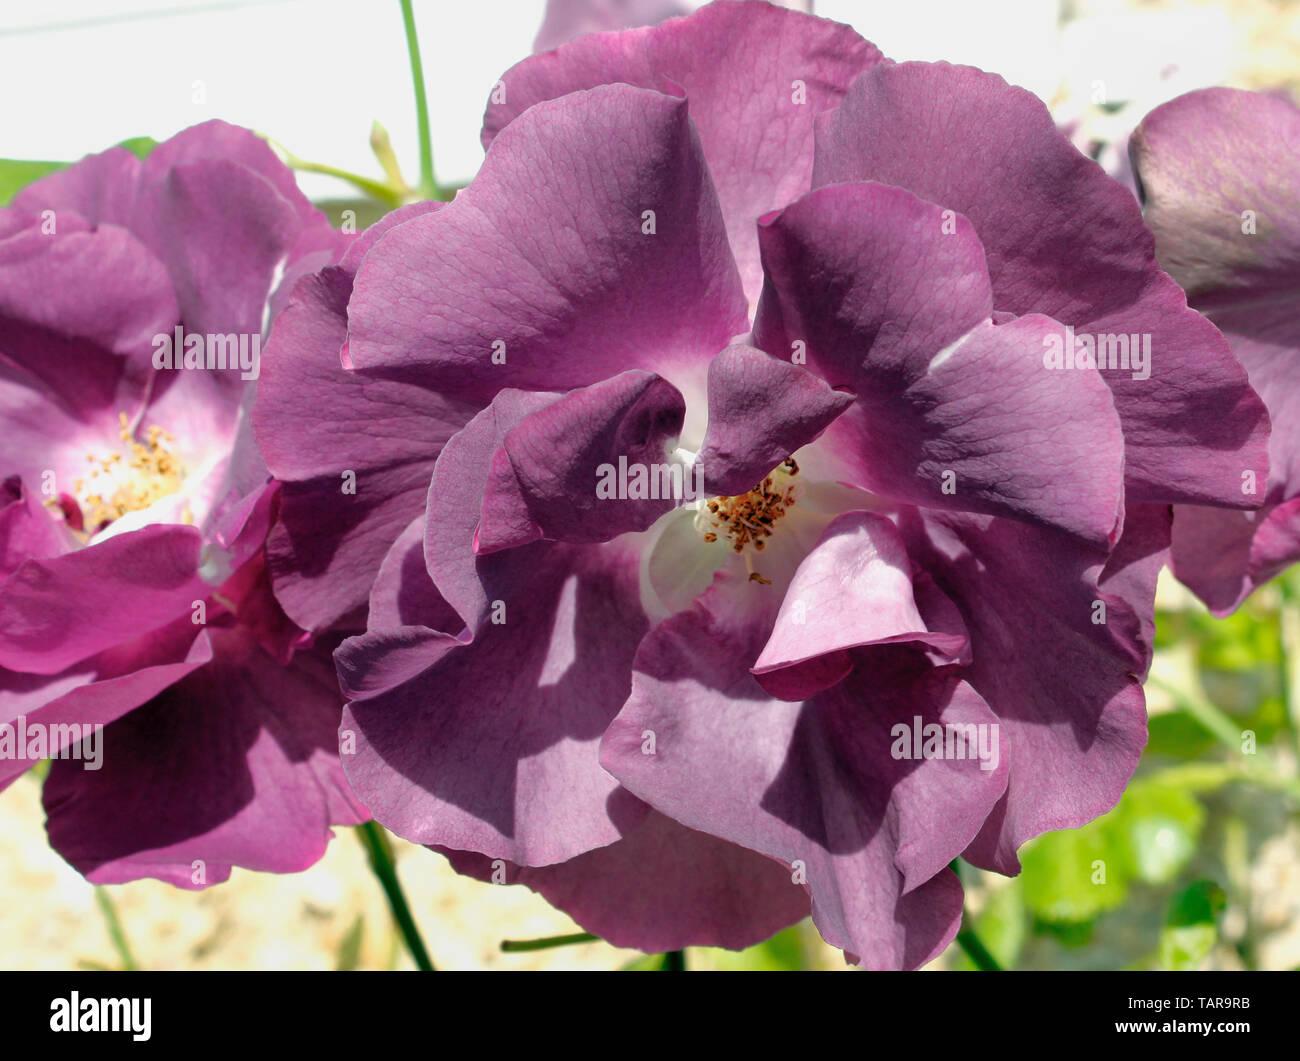 Close up of 'Rhapsody in Blue' modern Floribunda Rose - Stock Image